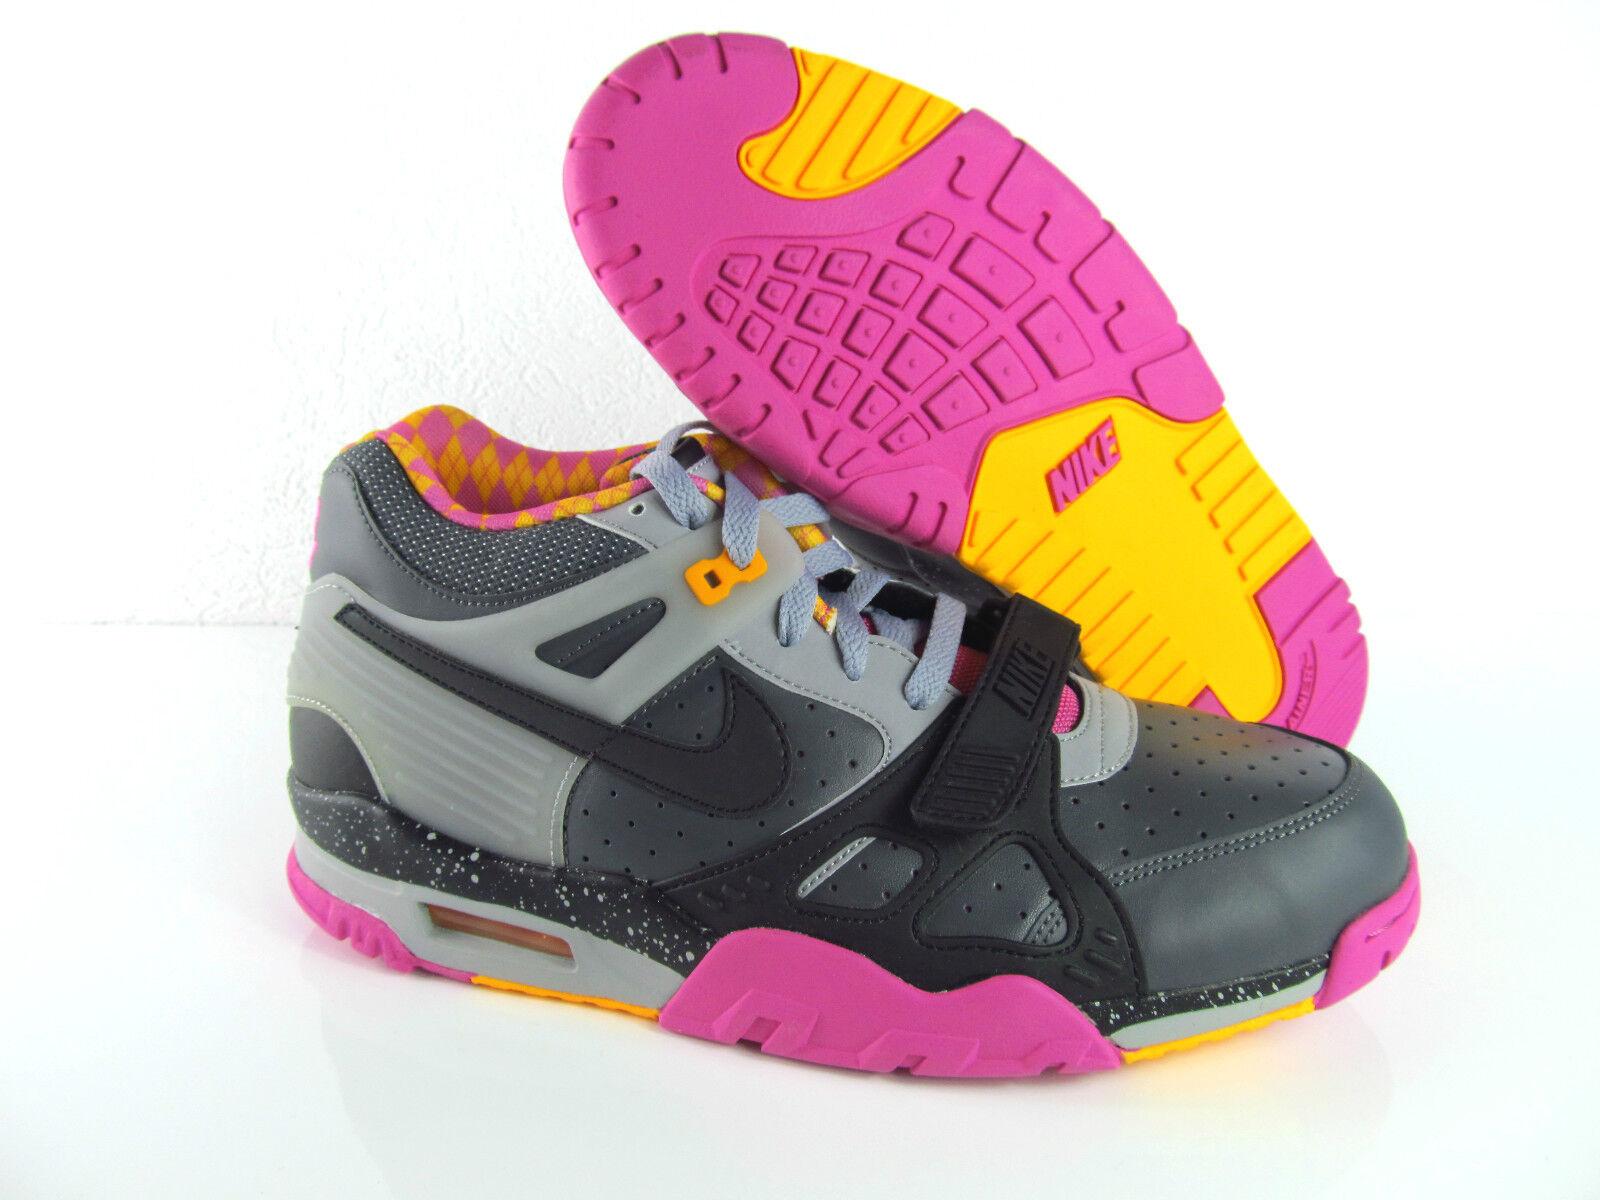 Nike Air Trainer III PRM QS Horse Racing Bo Jackson Sneaker US_11 UK_10 Eur 45